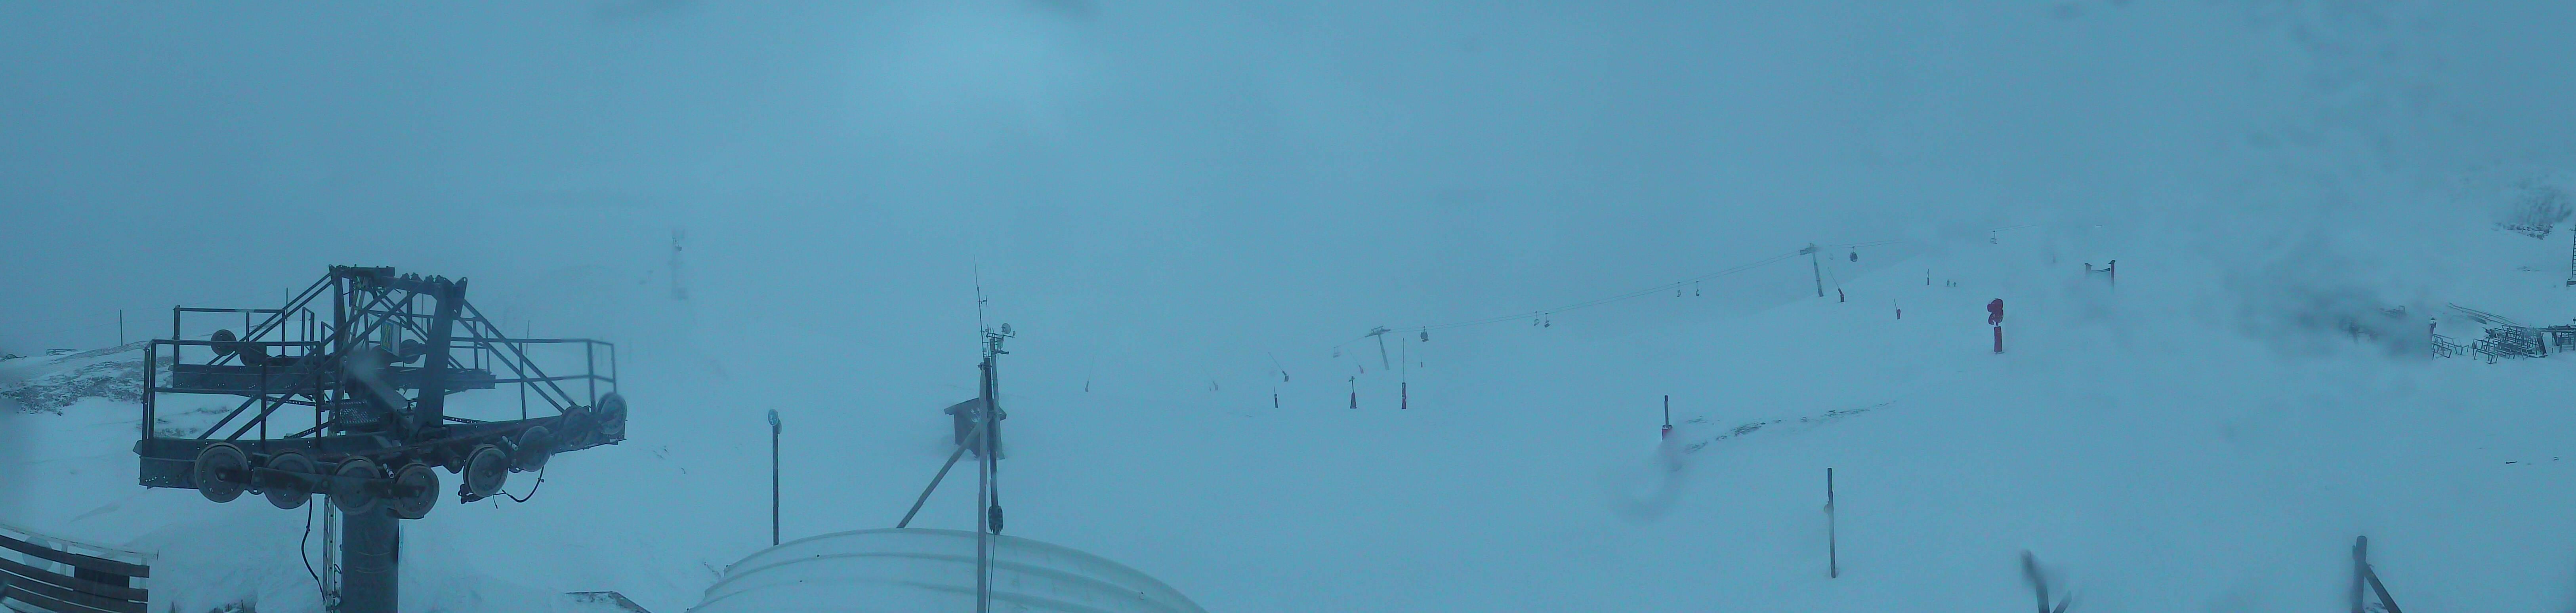 webcam 2 Alpes Bike Park